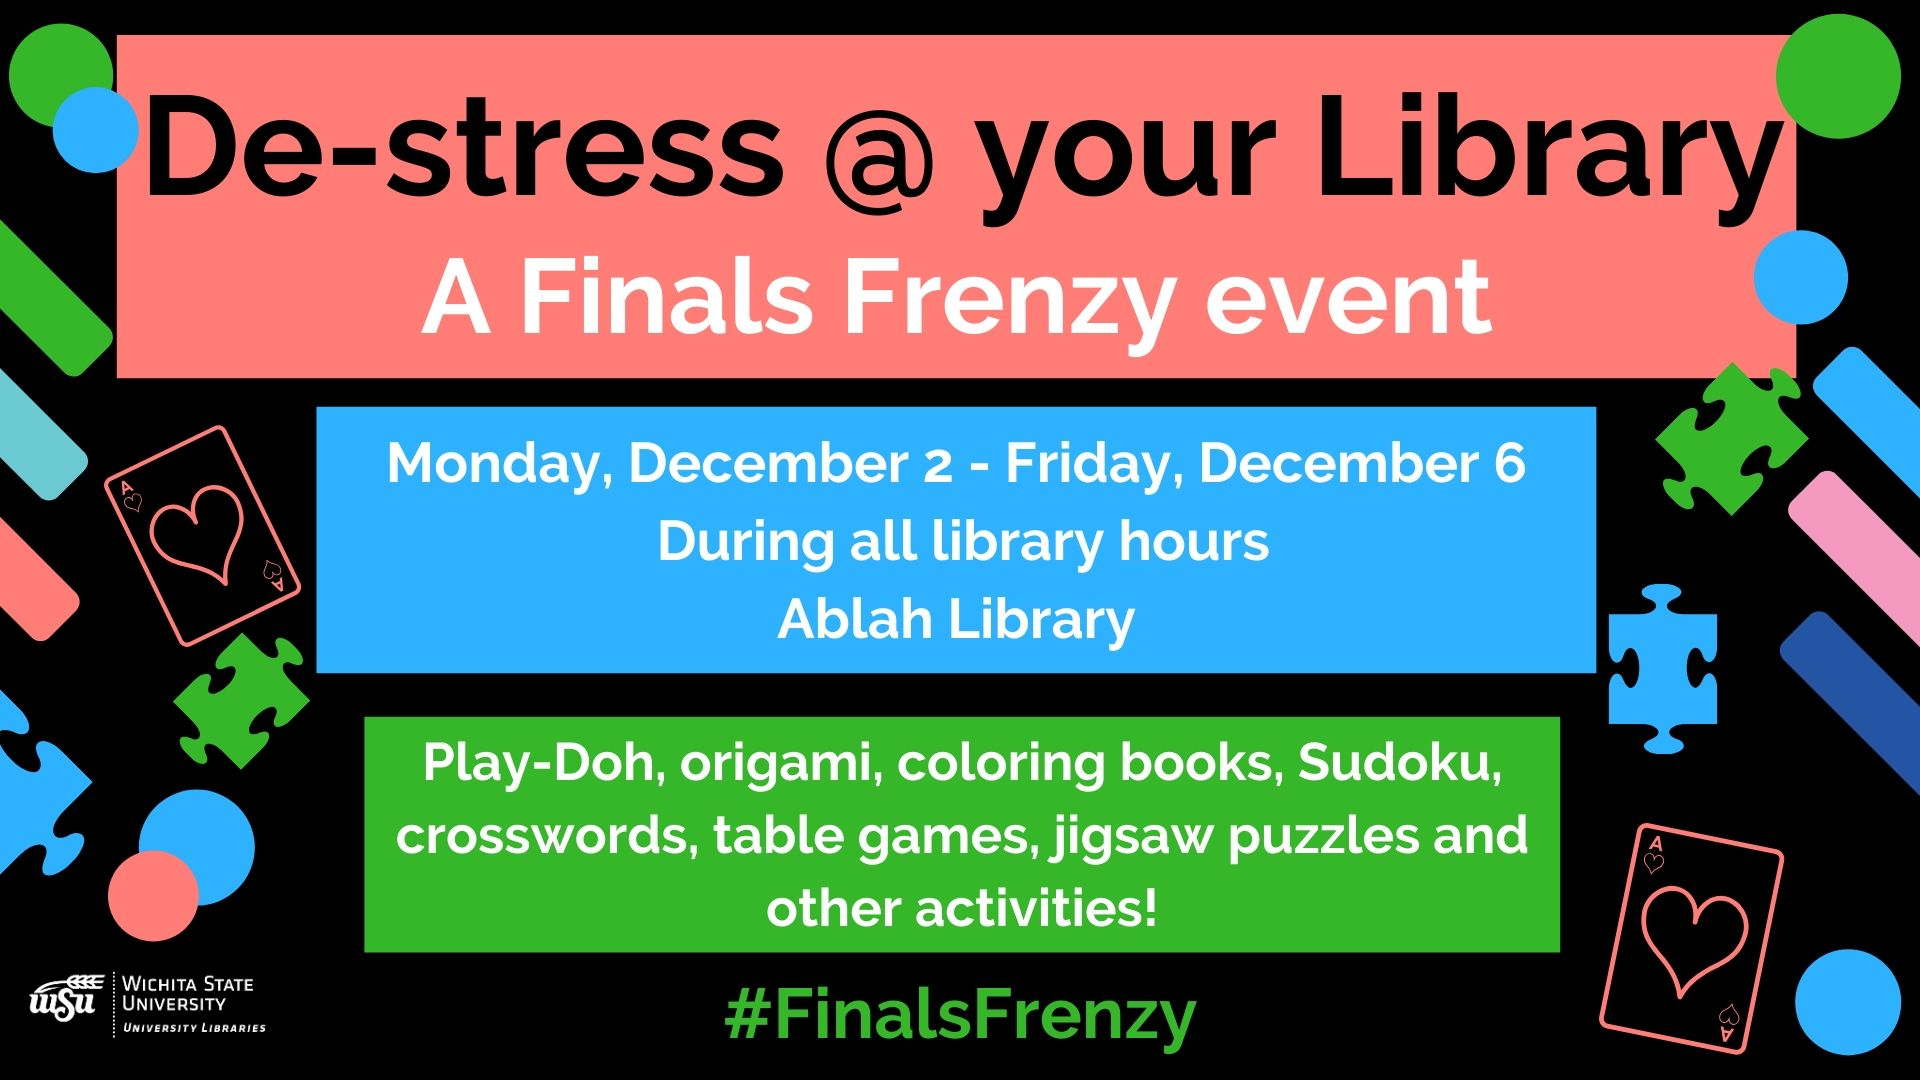 De-stress @ Your Library